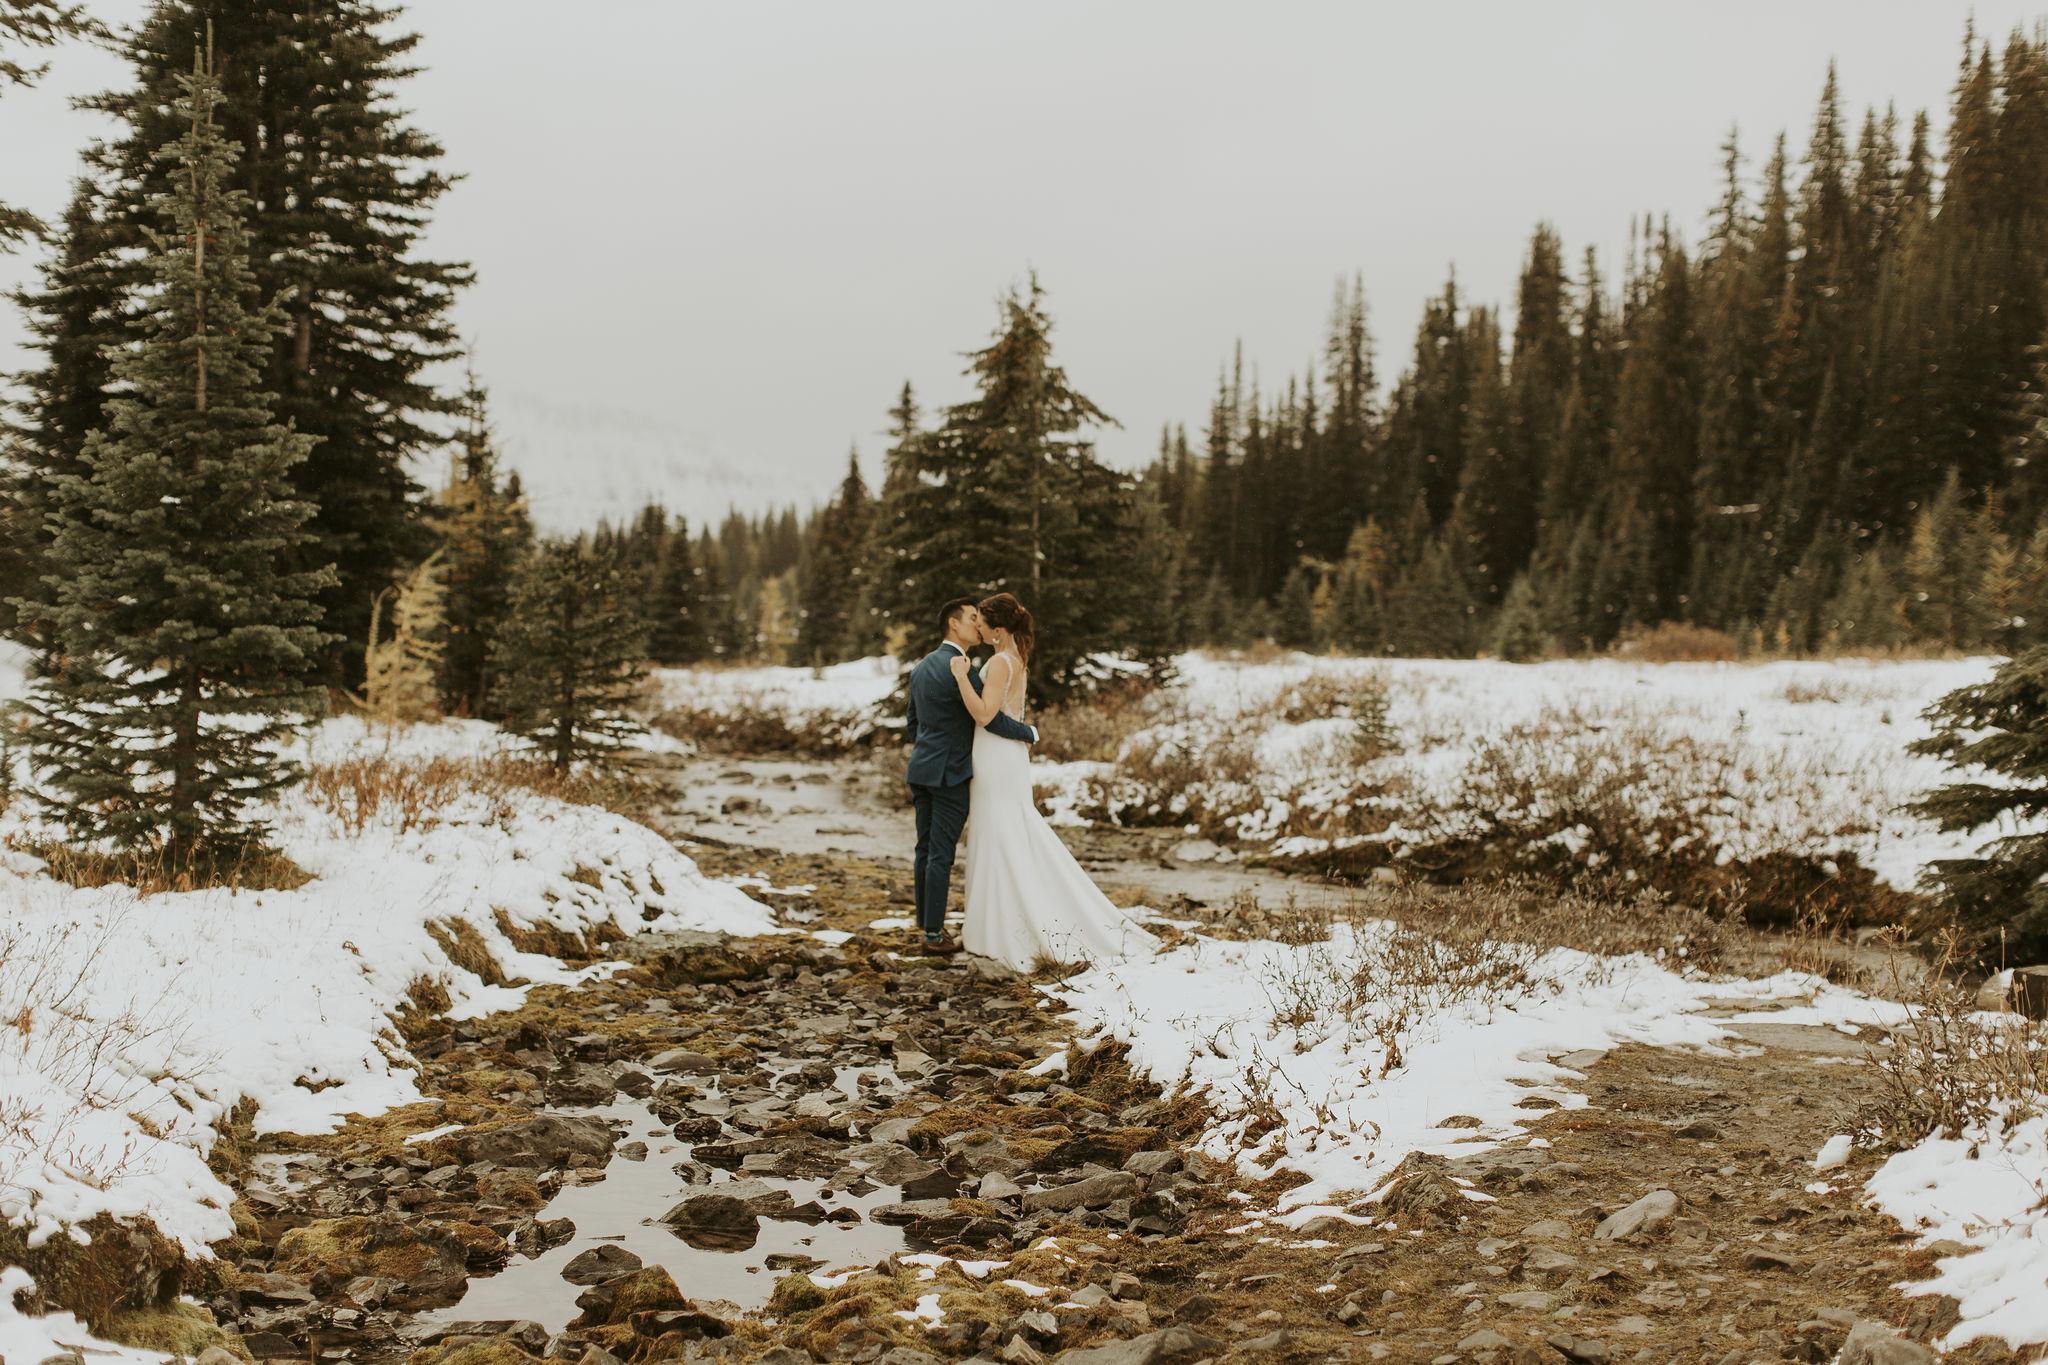 AK_Wedding_MountainPortraits-97.jpg